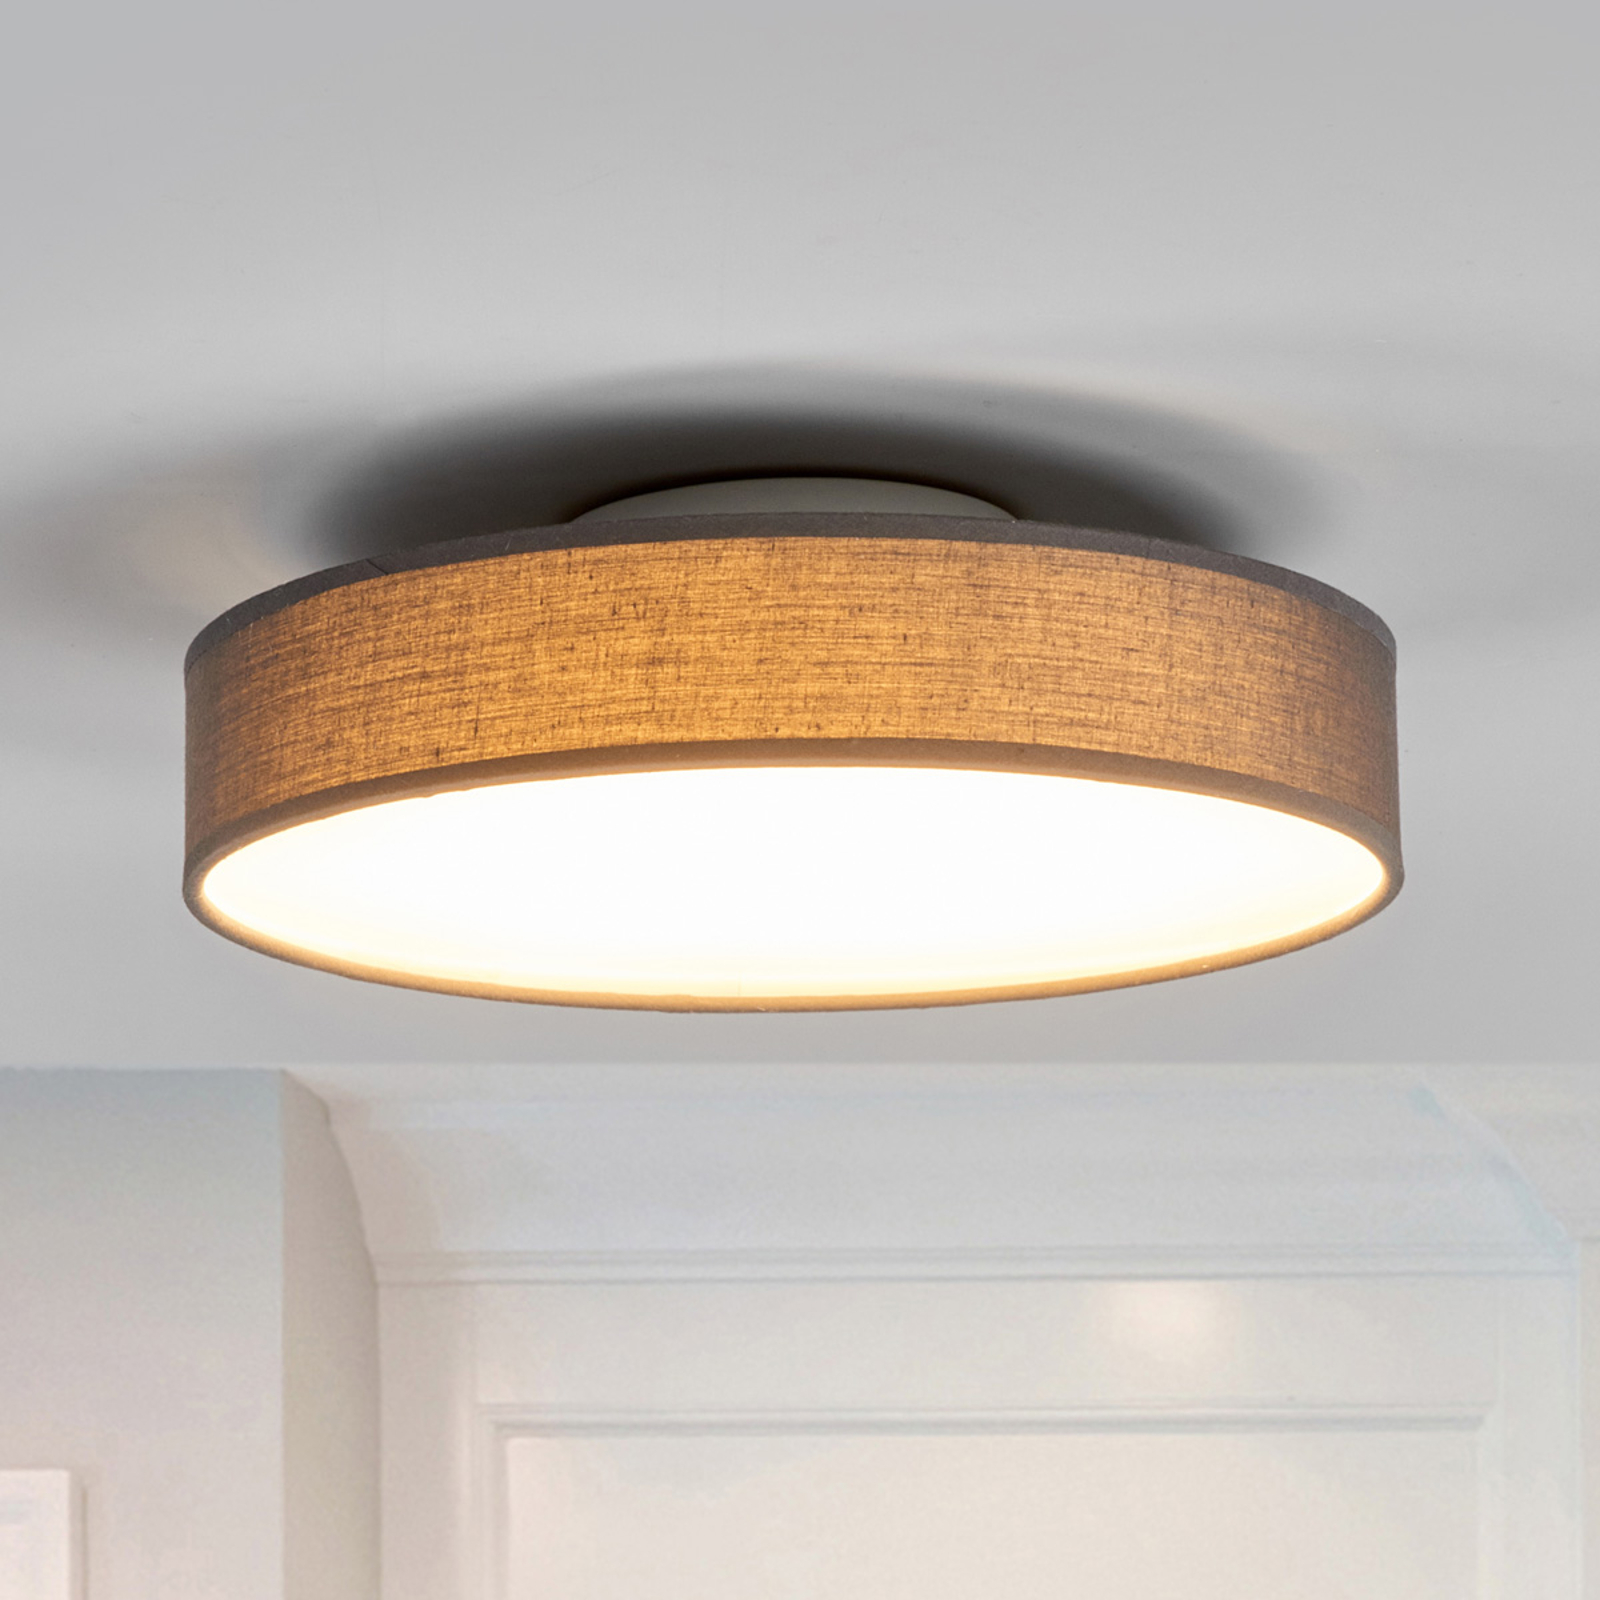 Stoffen LED-plafondlamp Saira, 30 cm, grijs